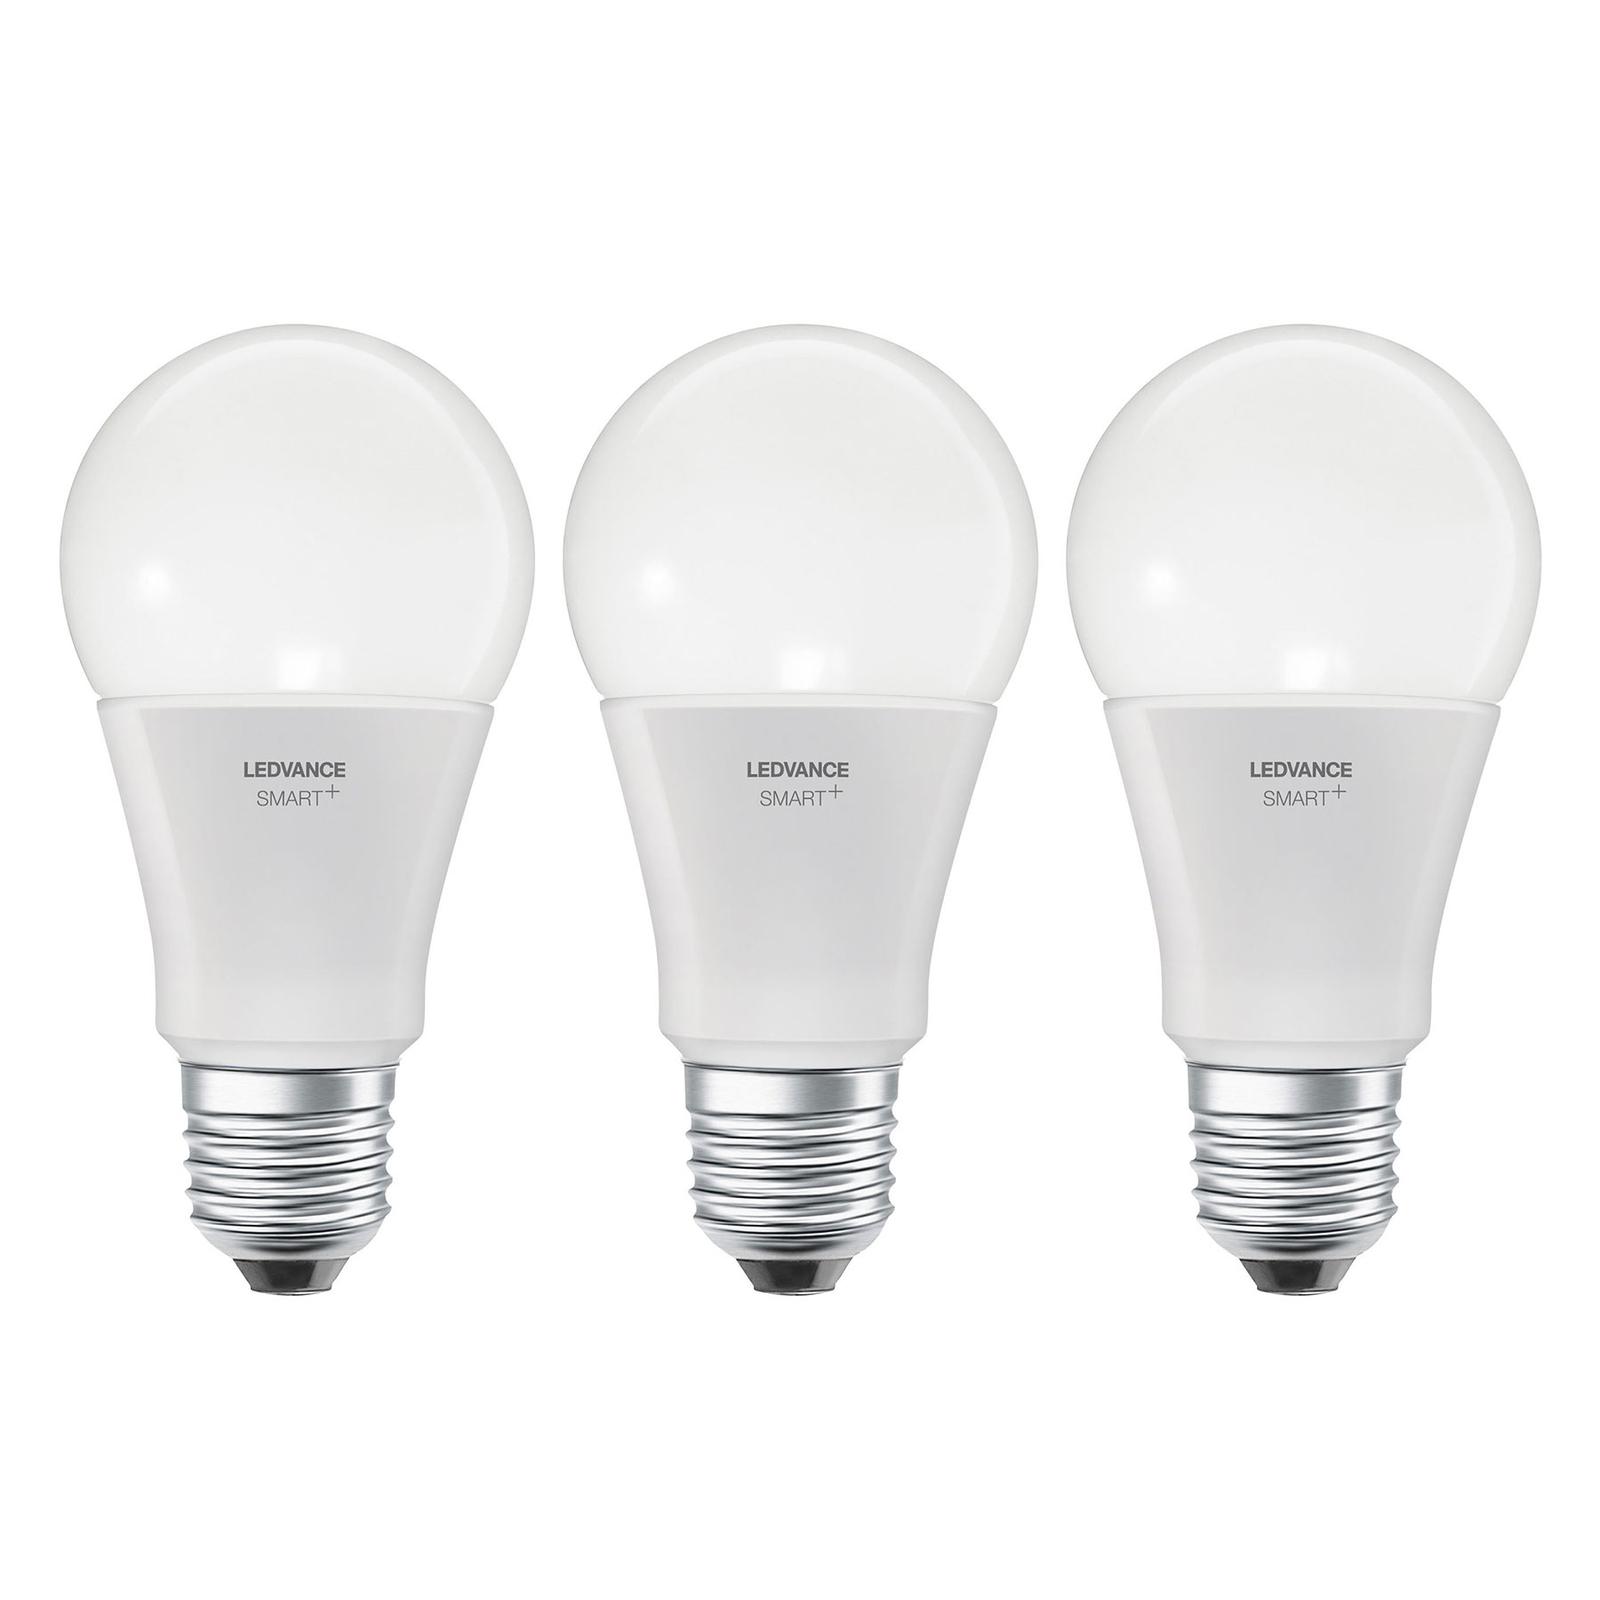 LEDVANCE SMART+ WiFi E27 14W Classic CCT 3er